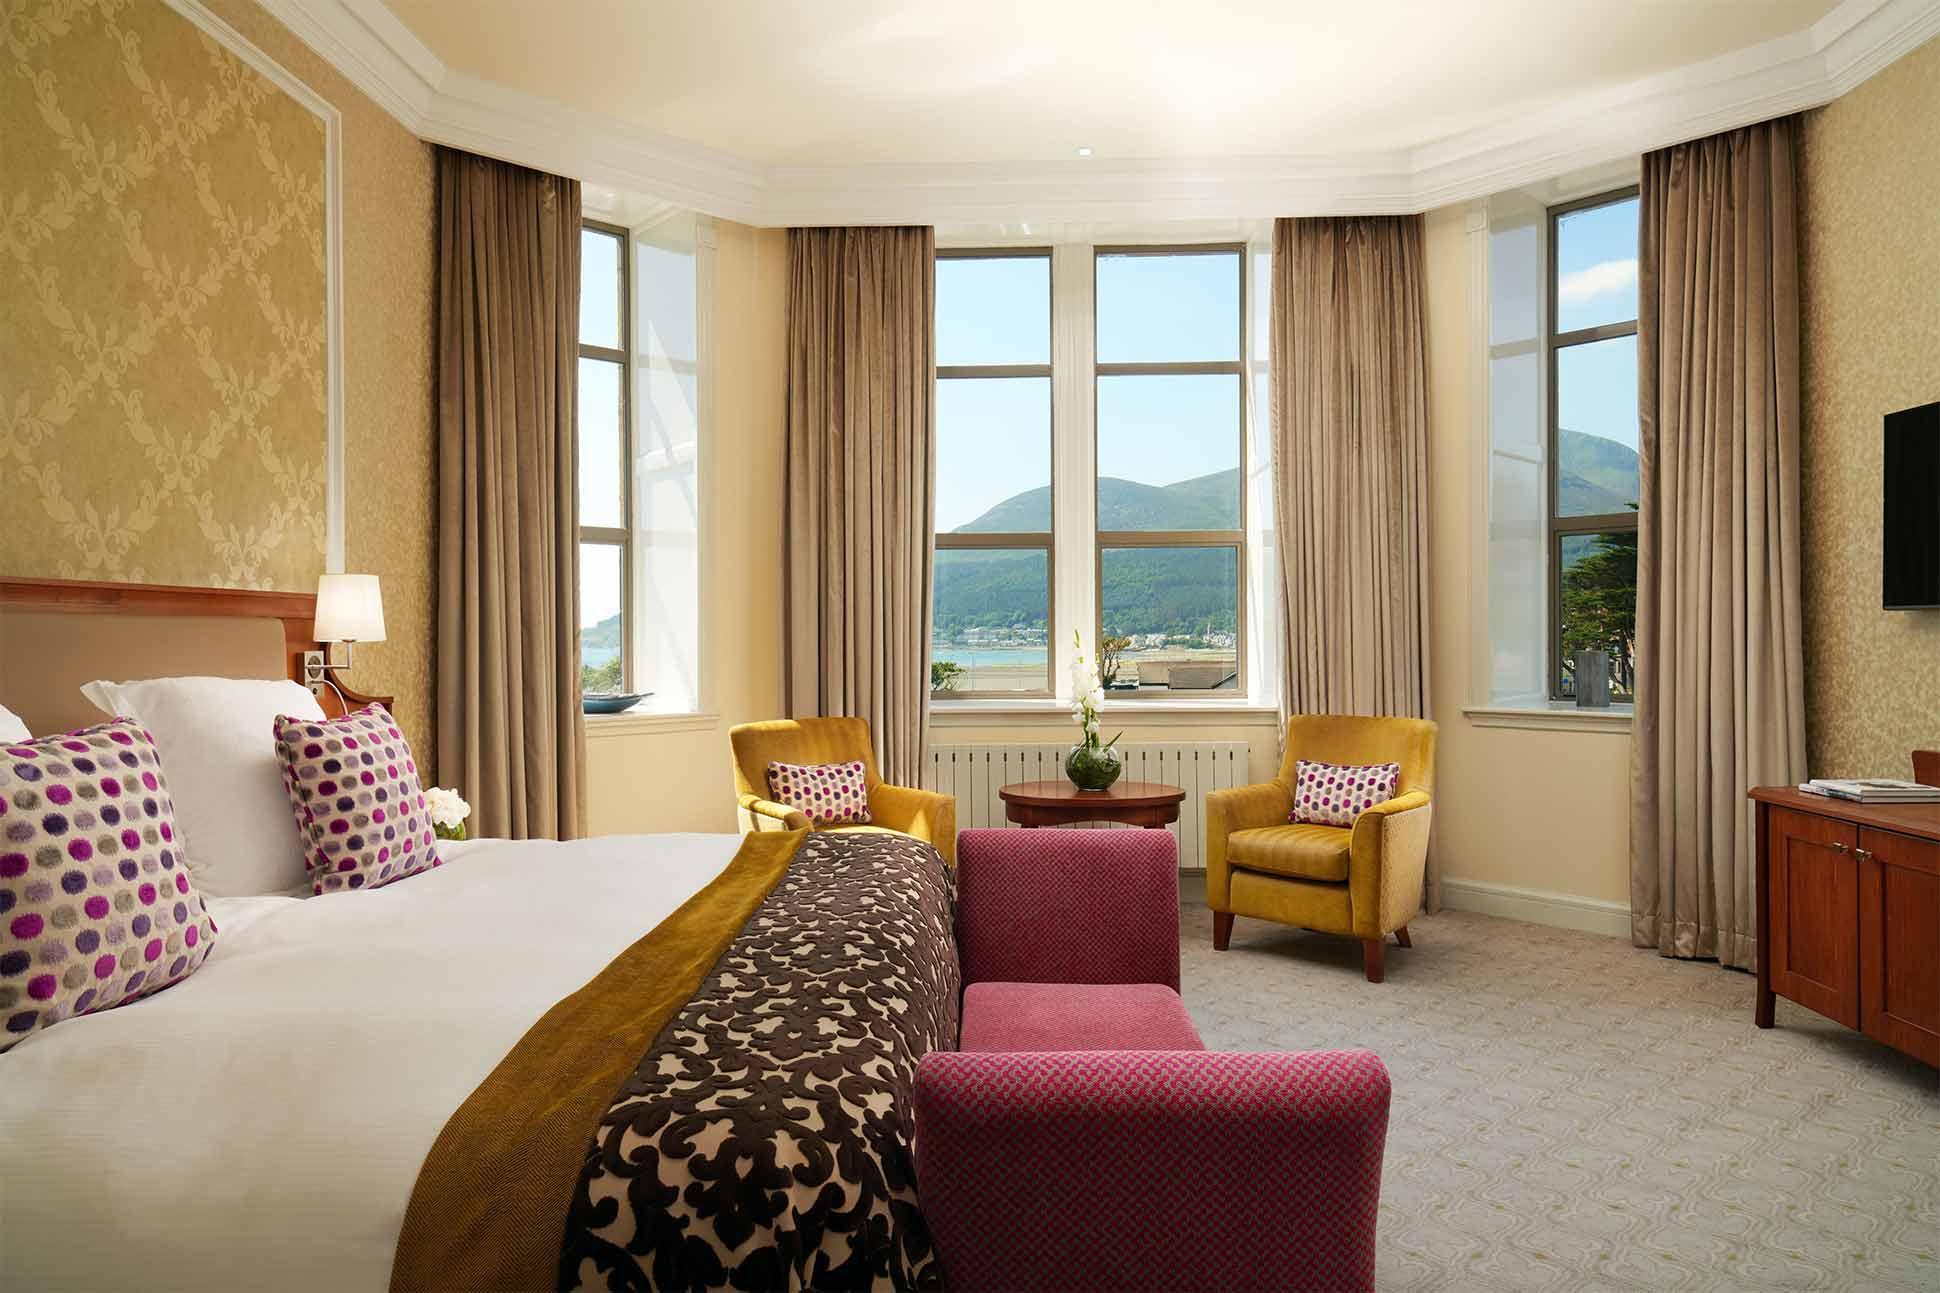 Slieve Donard Resort & Spa <br> Newcastle, Northern Ireland, United Kingdom